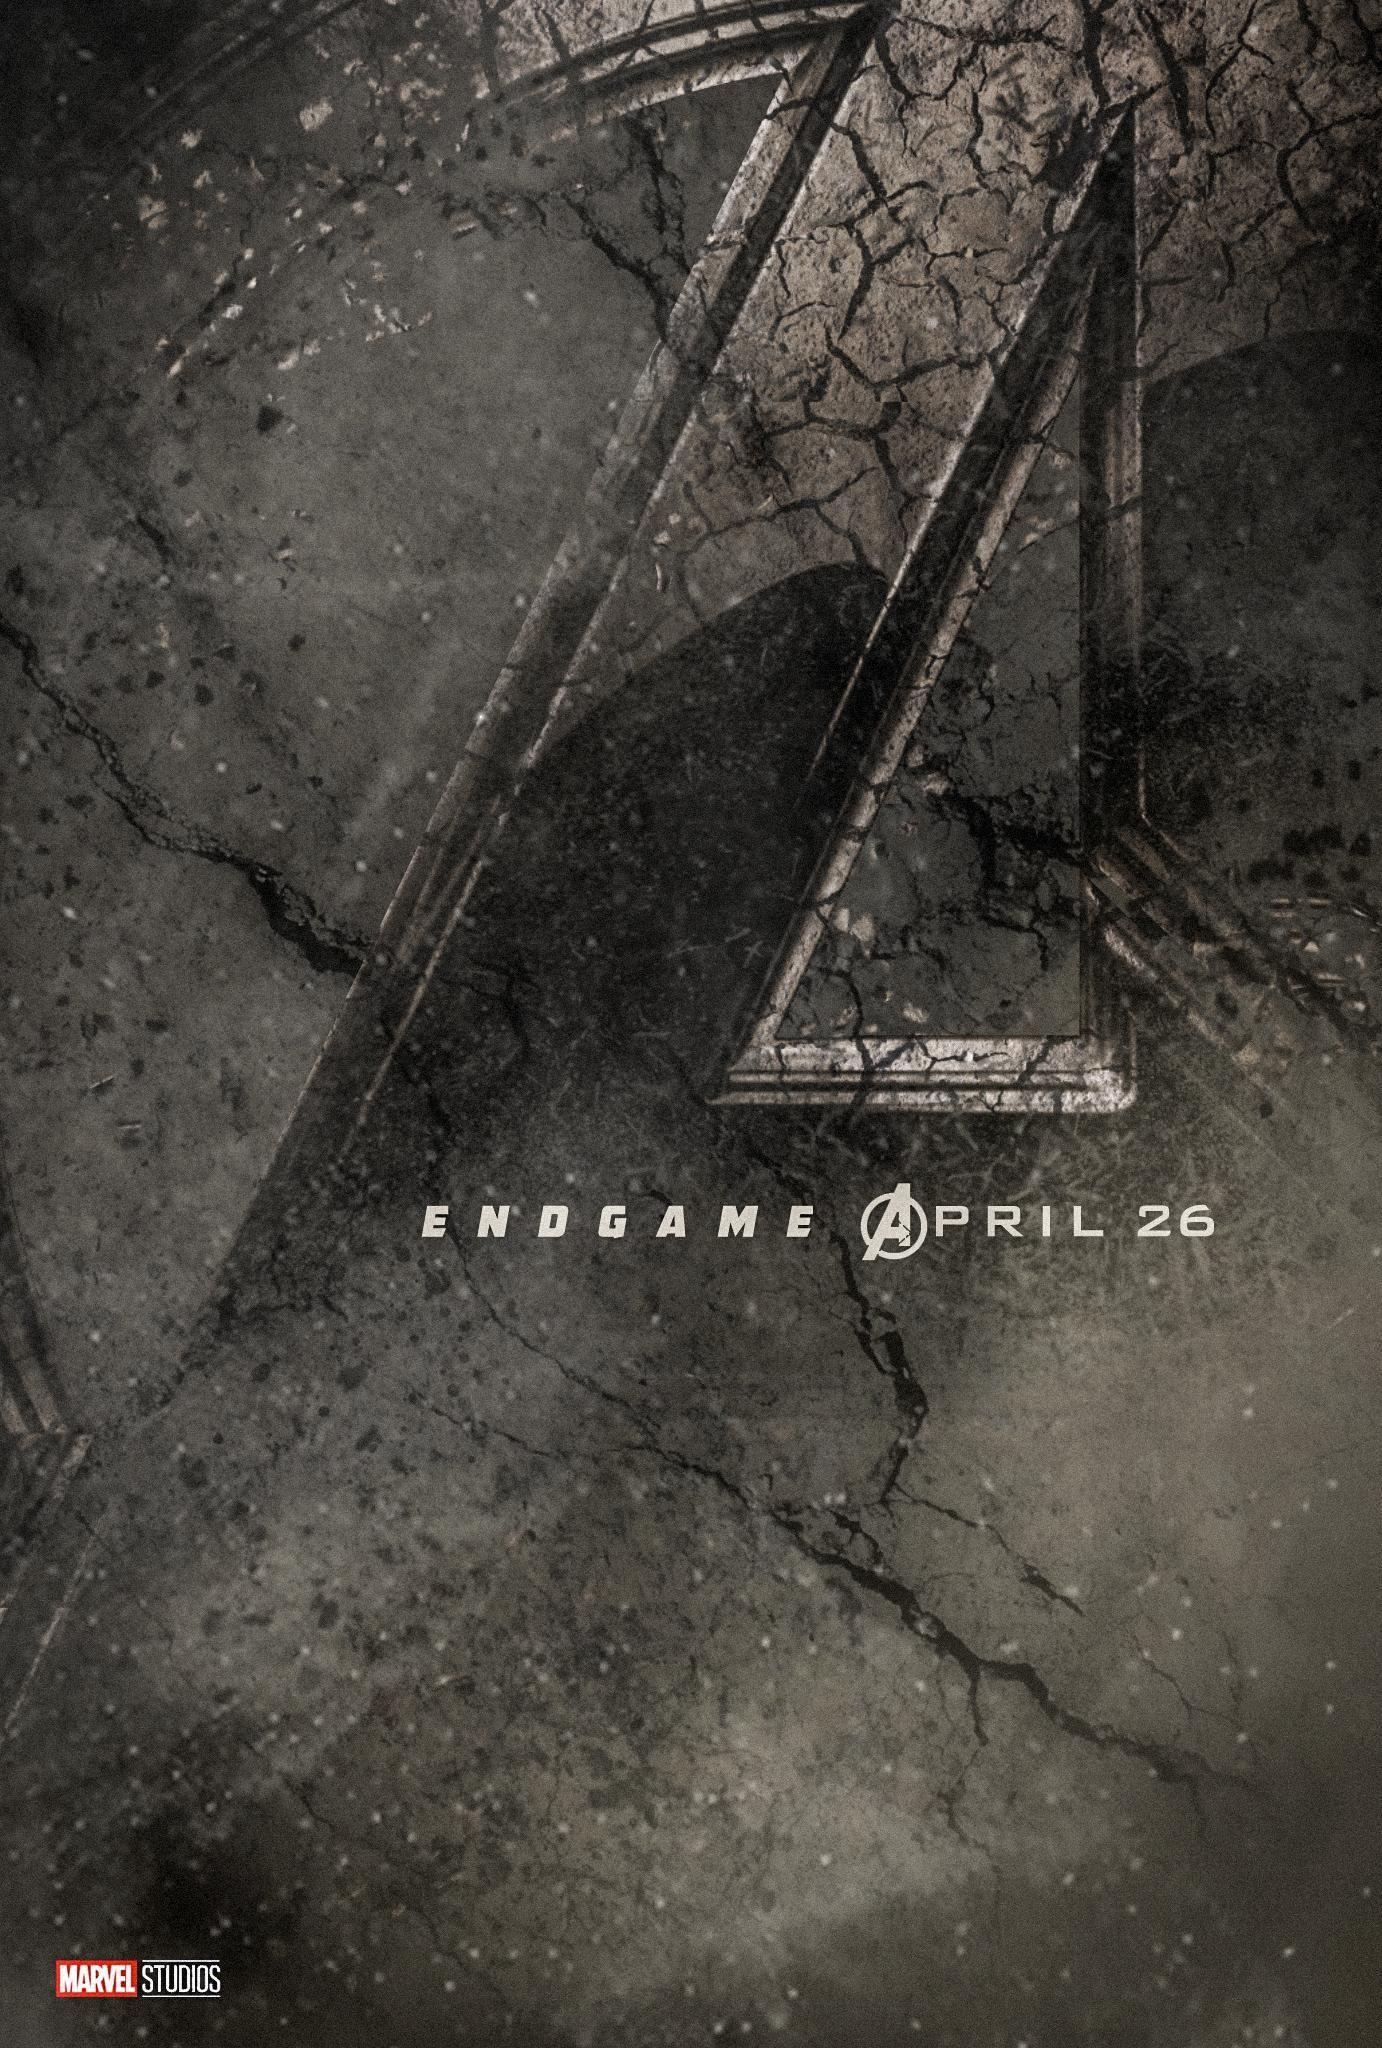 Avengers 4 Teaser Poster (Fan Art) [Spoiler] (Dengan gambar)